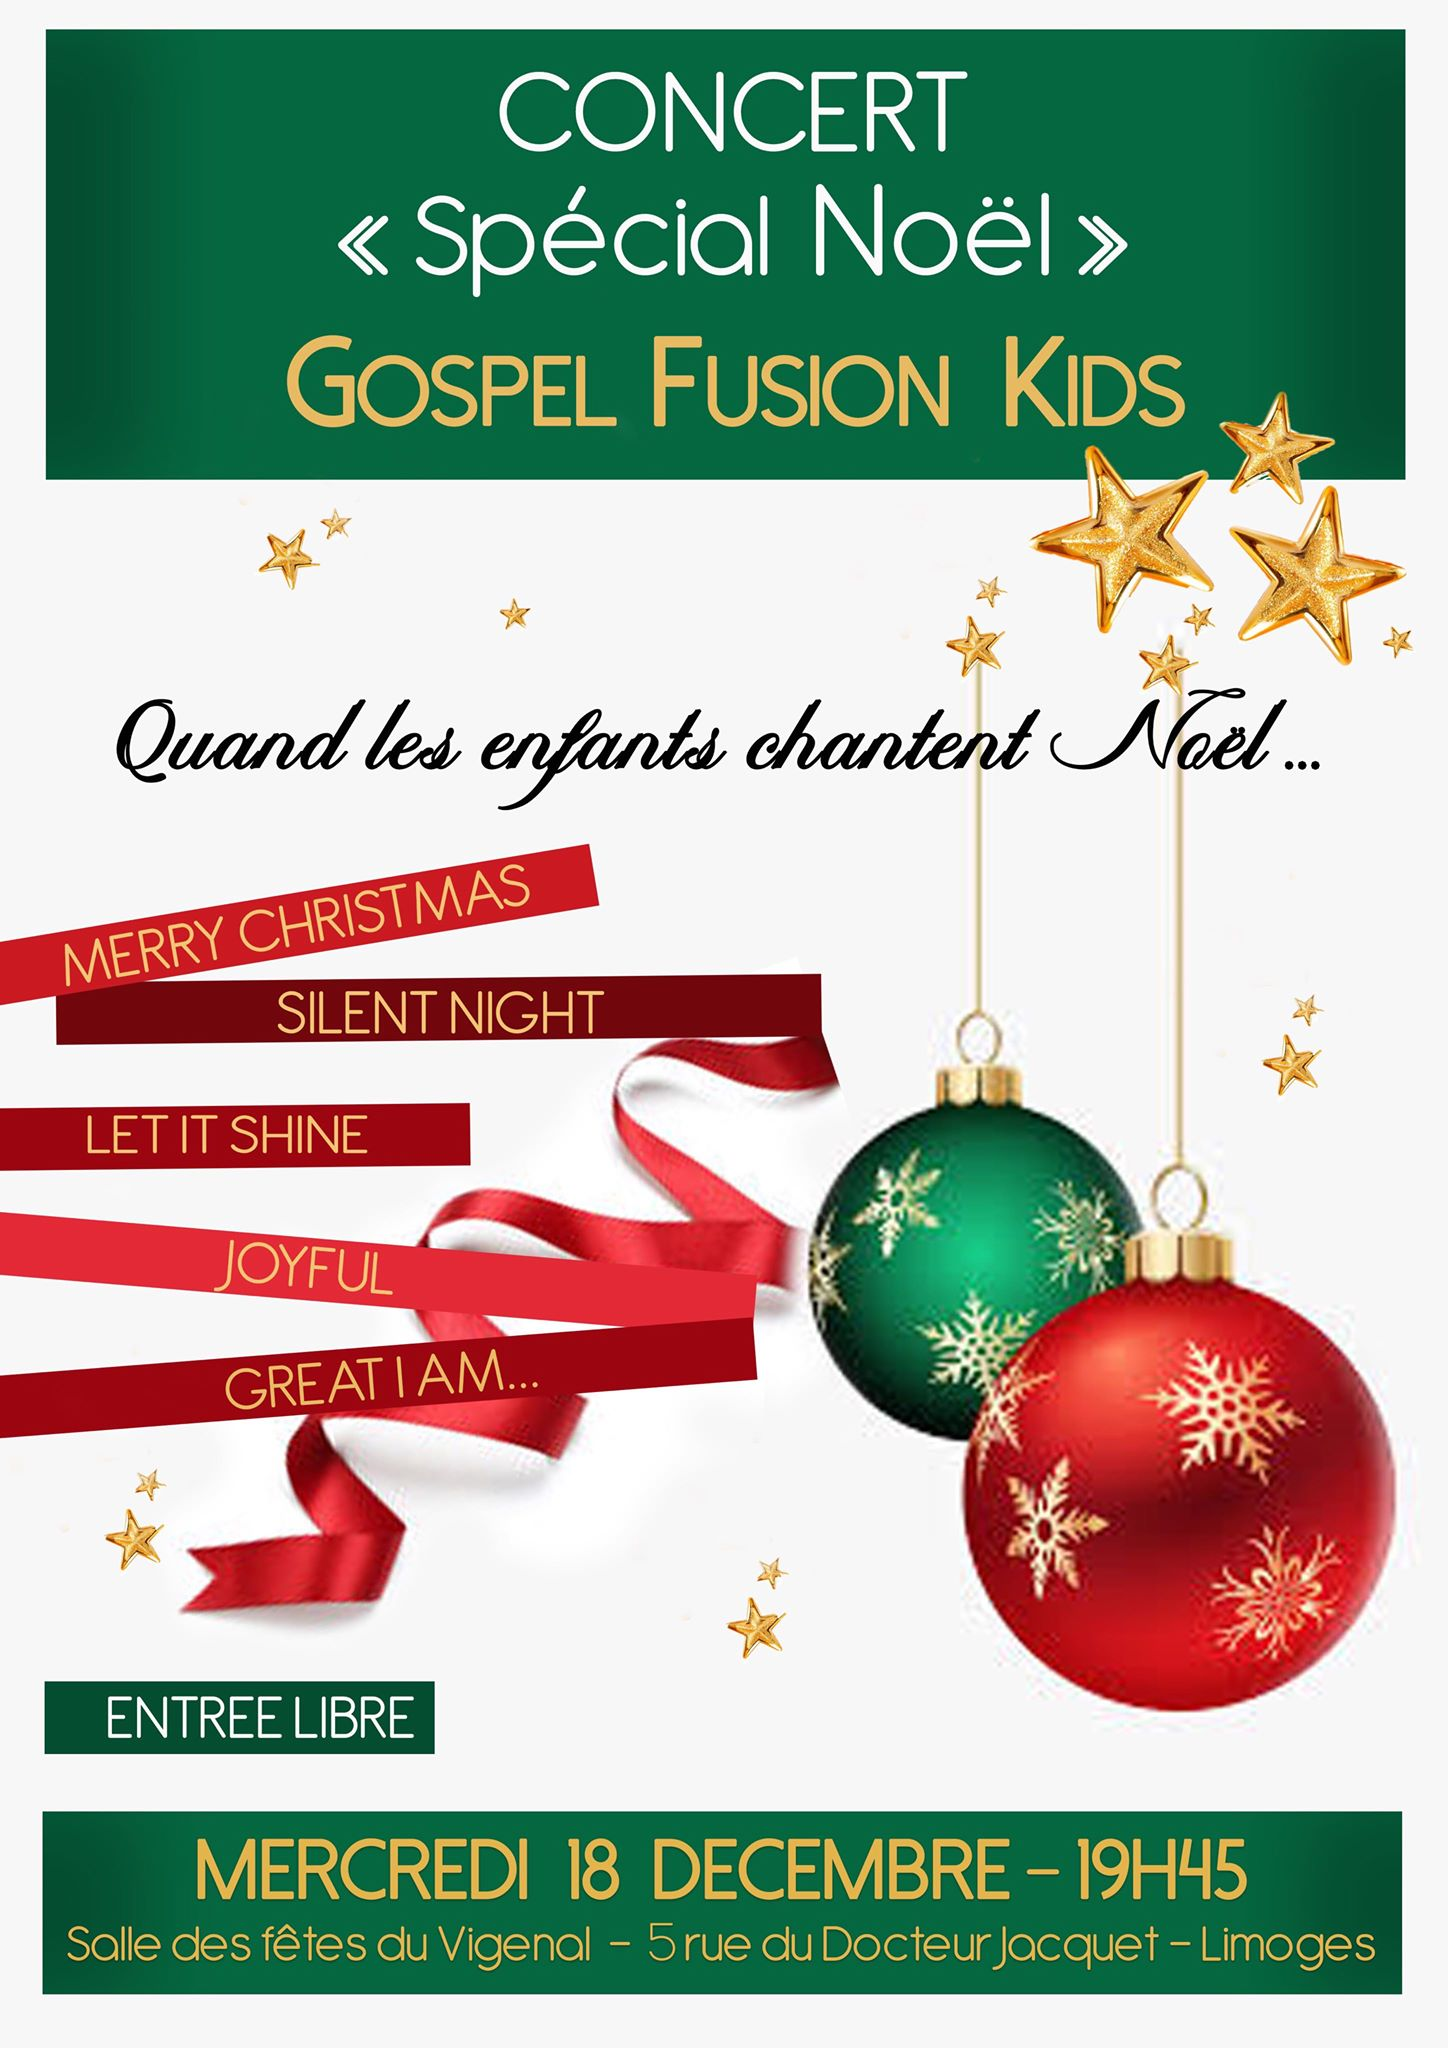 Concert spécial Noël Gospel Fusion kids